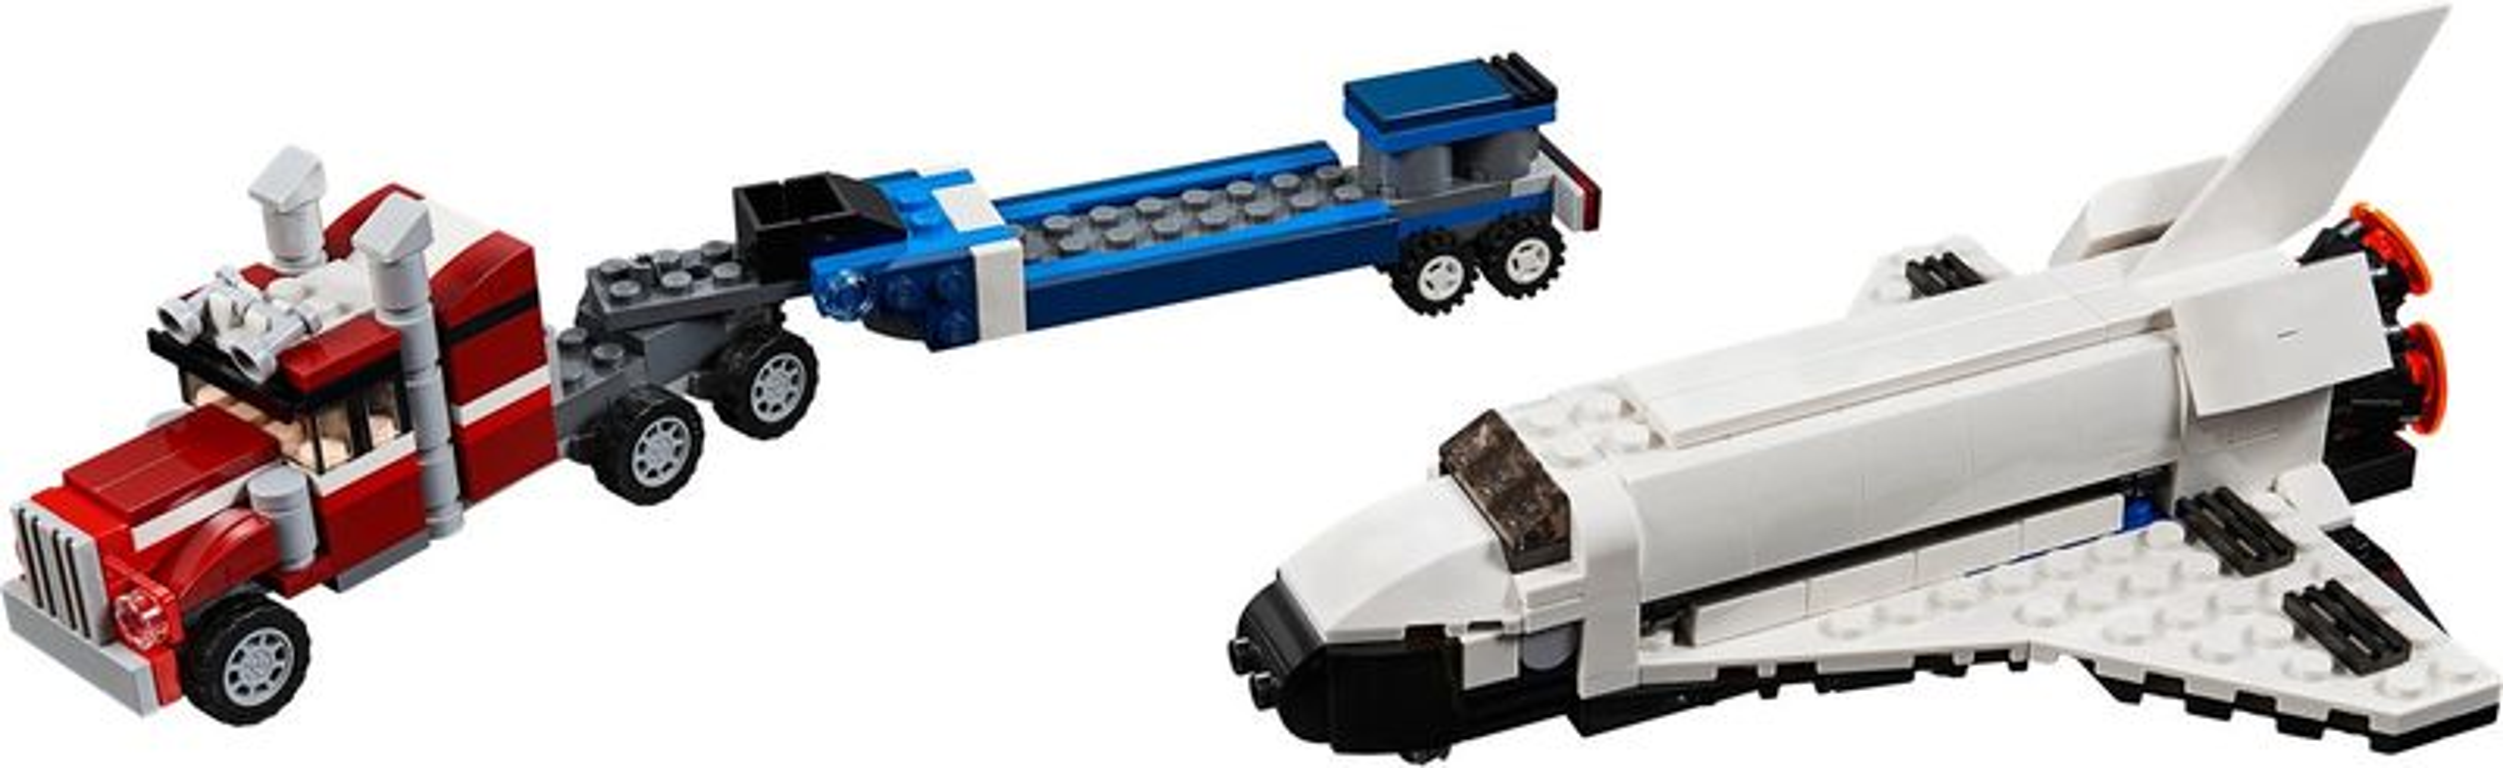 LEGO® Creator Shuttle Transporter components